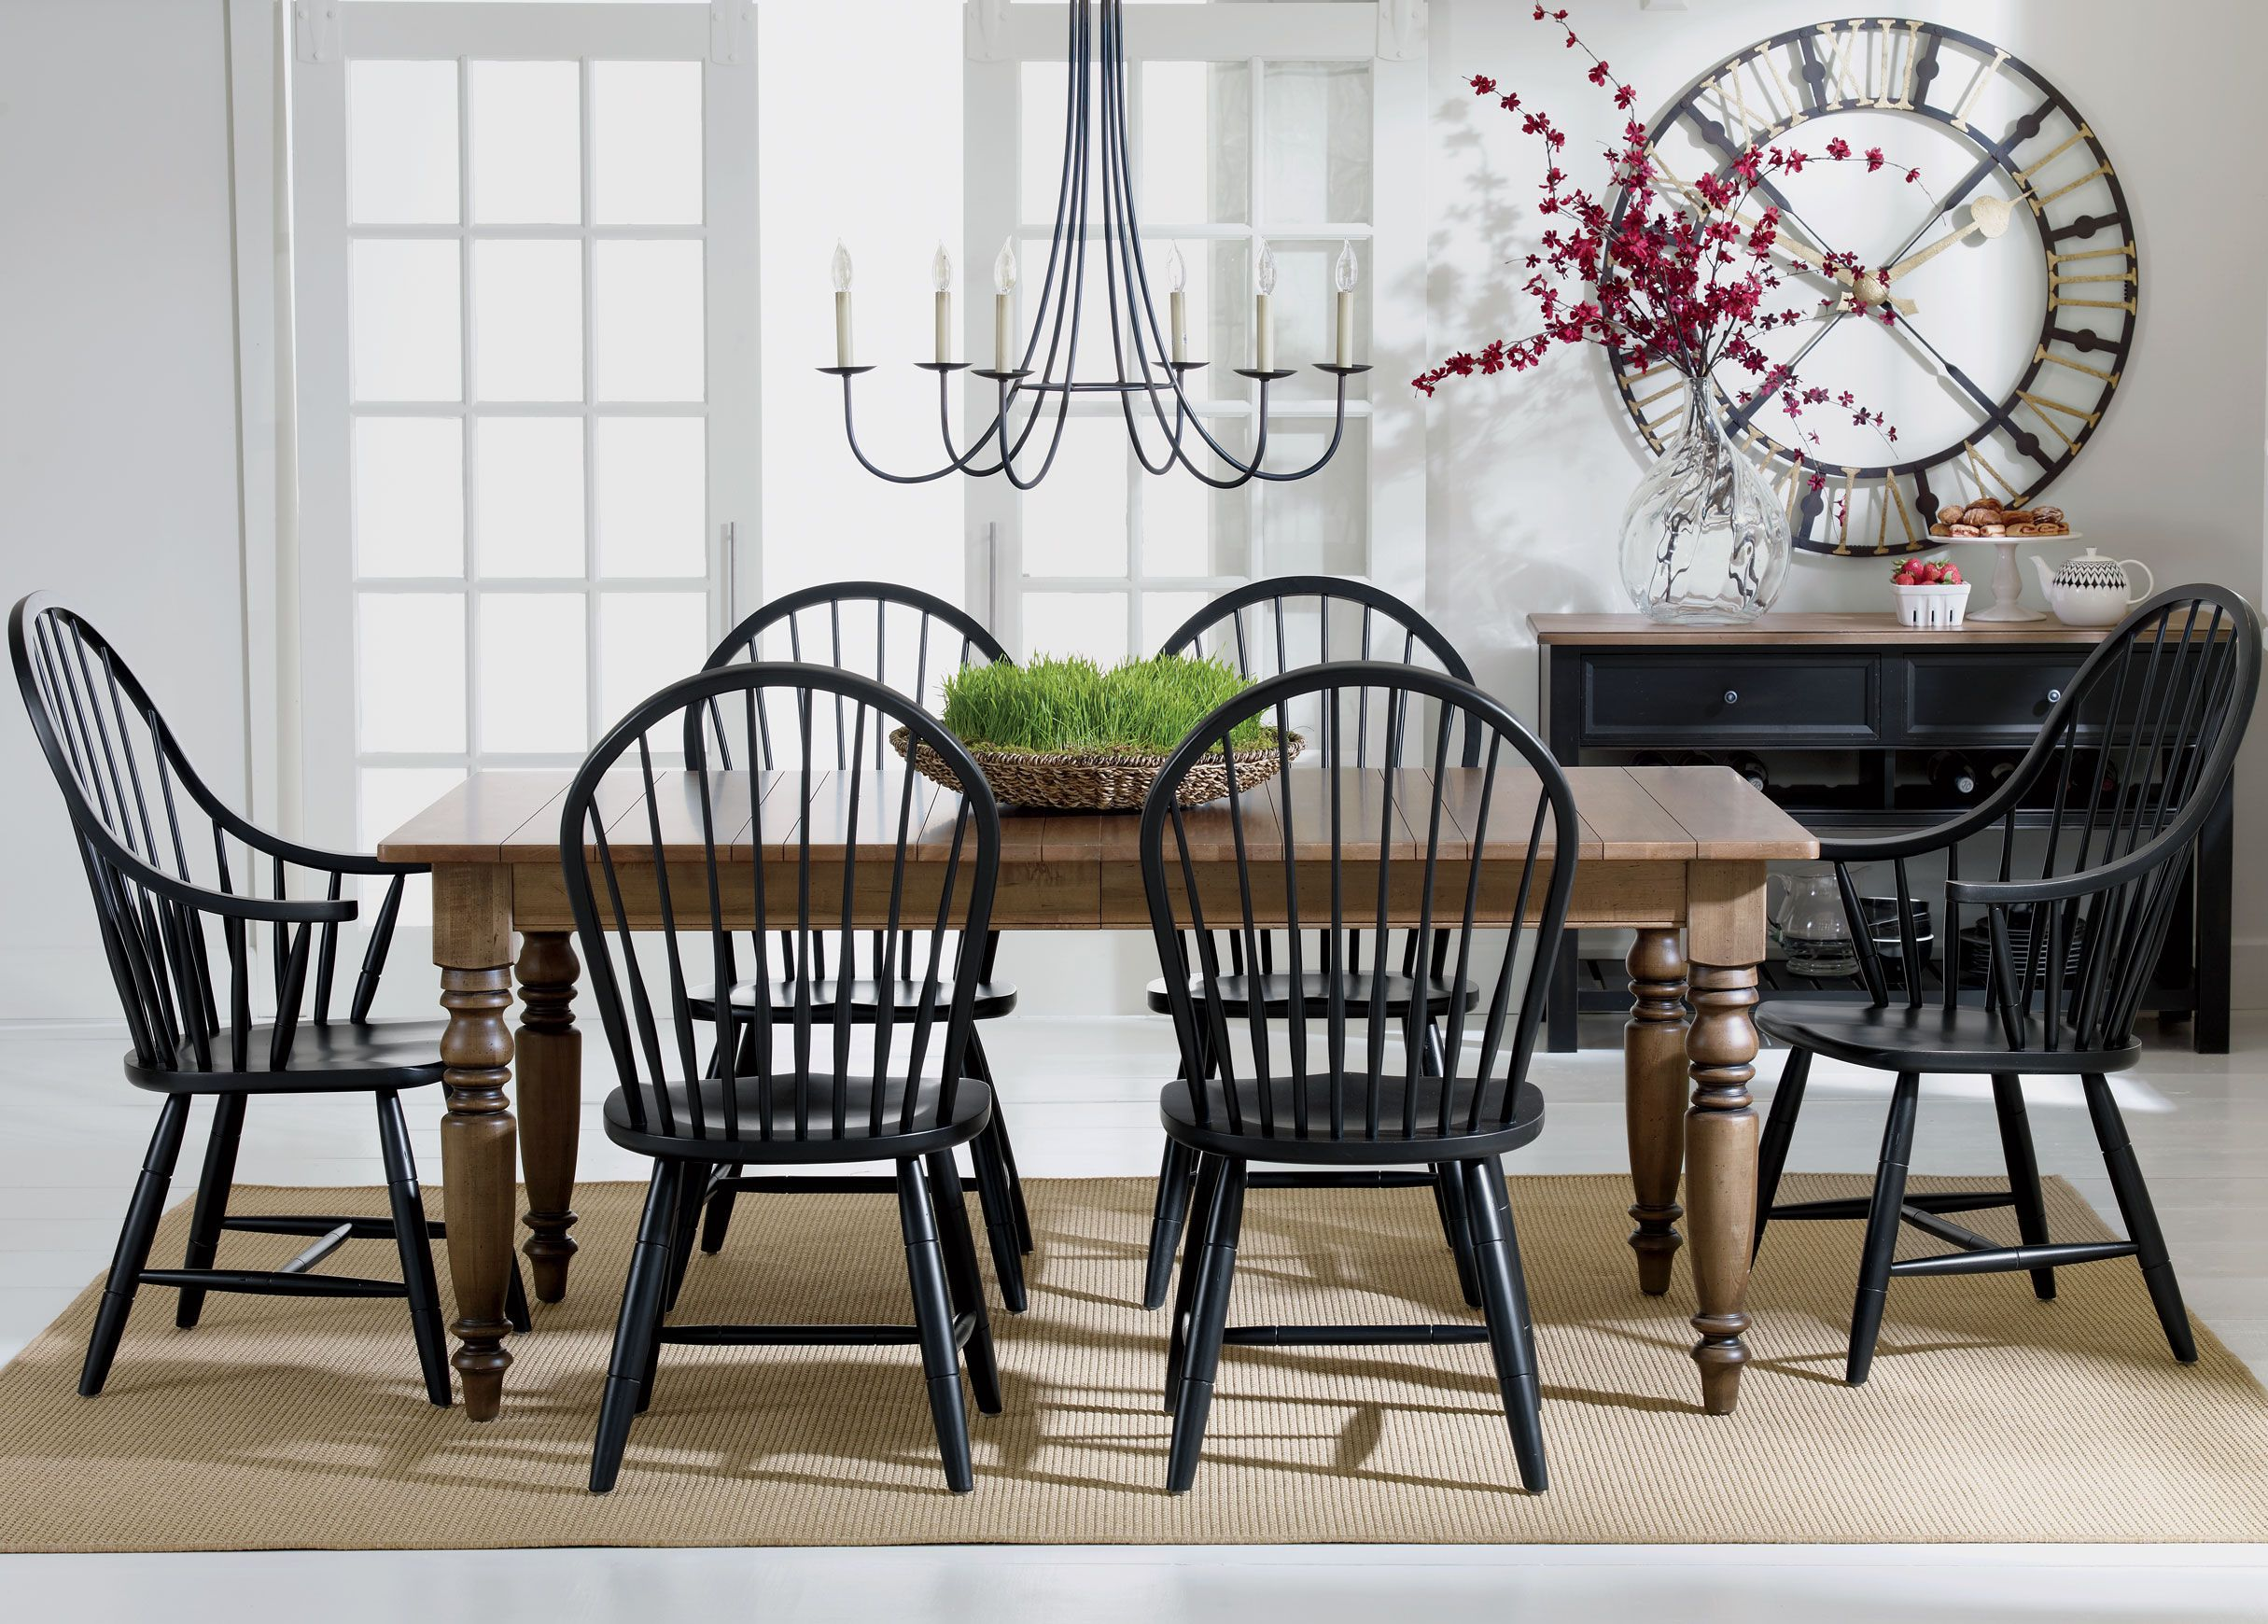 Ethan Allen Miller Large Dining Table Black Windsor Chairs Black